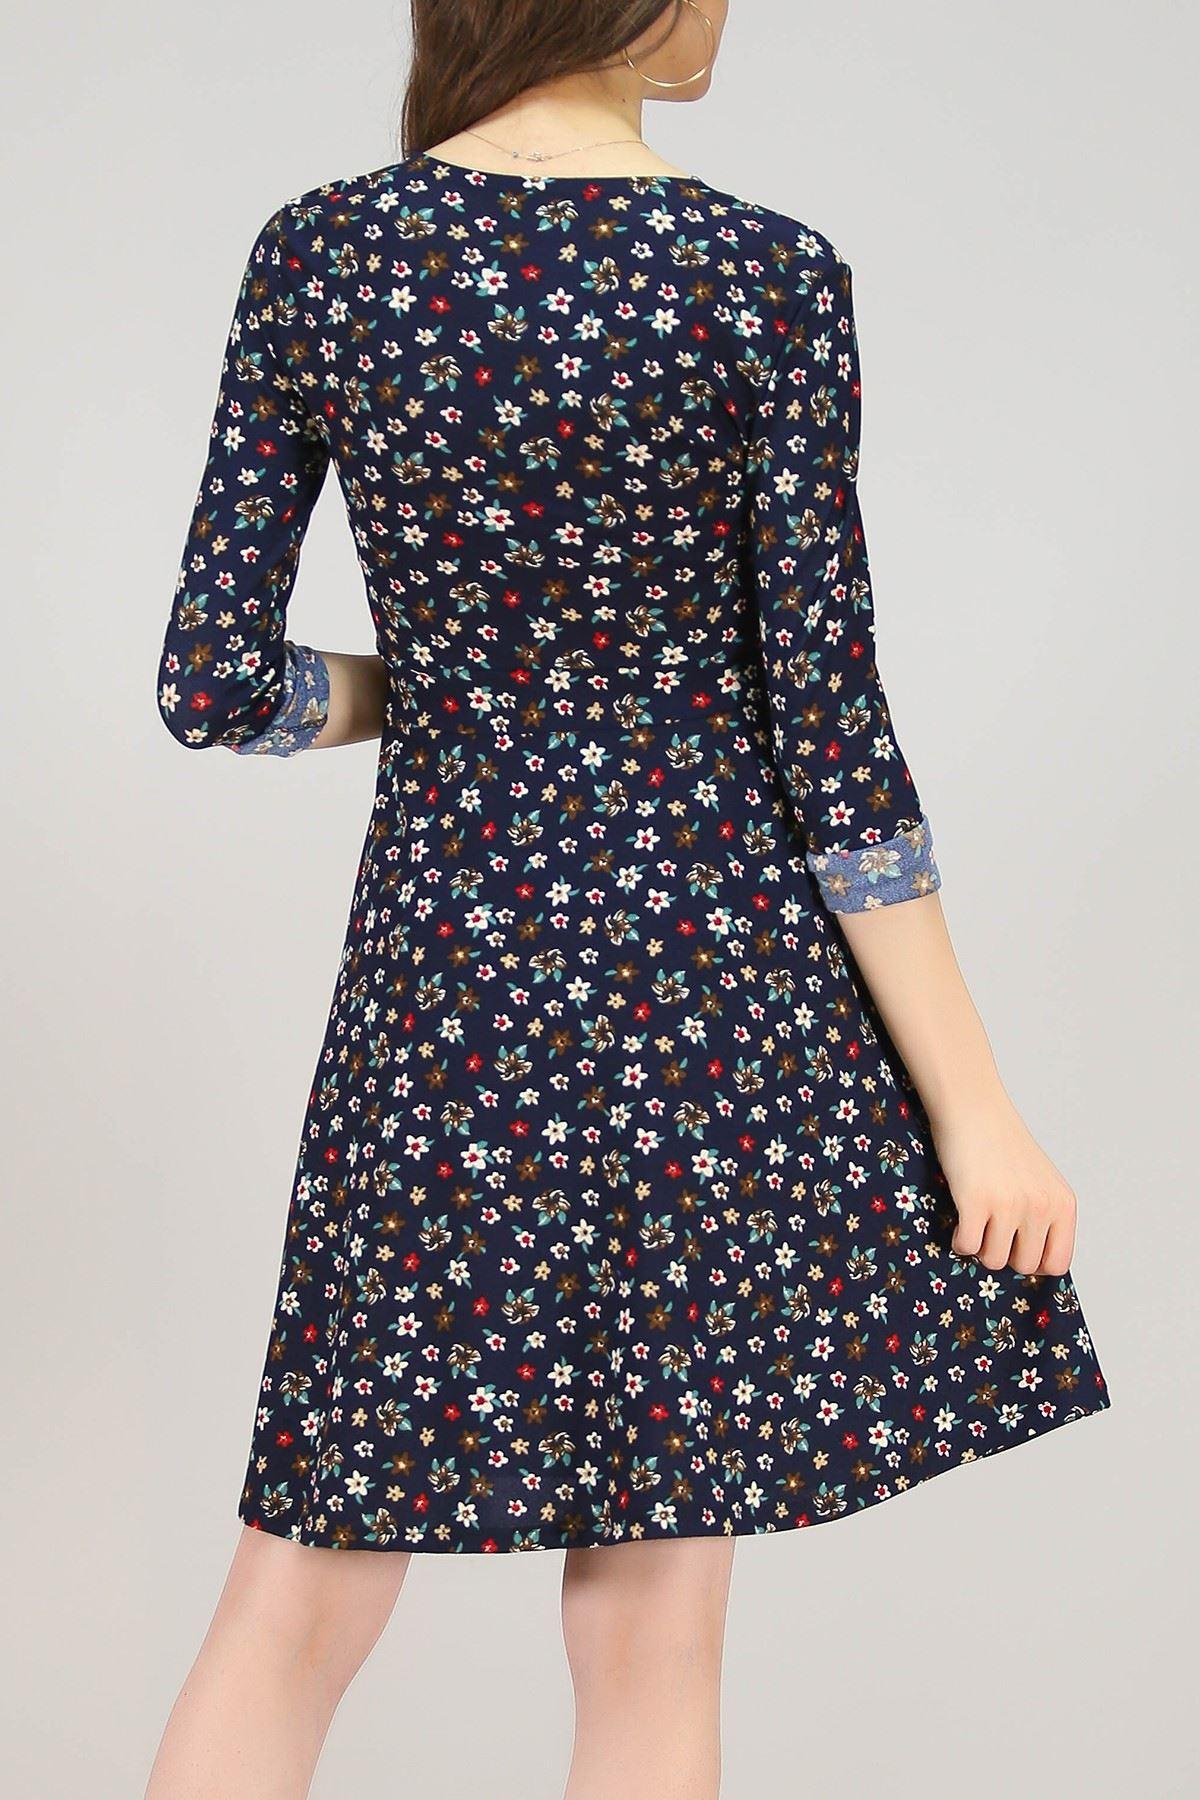 Desenli Elbise Lacivert - 4986.716.